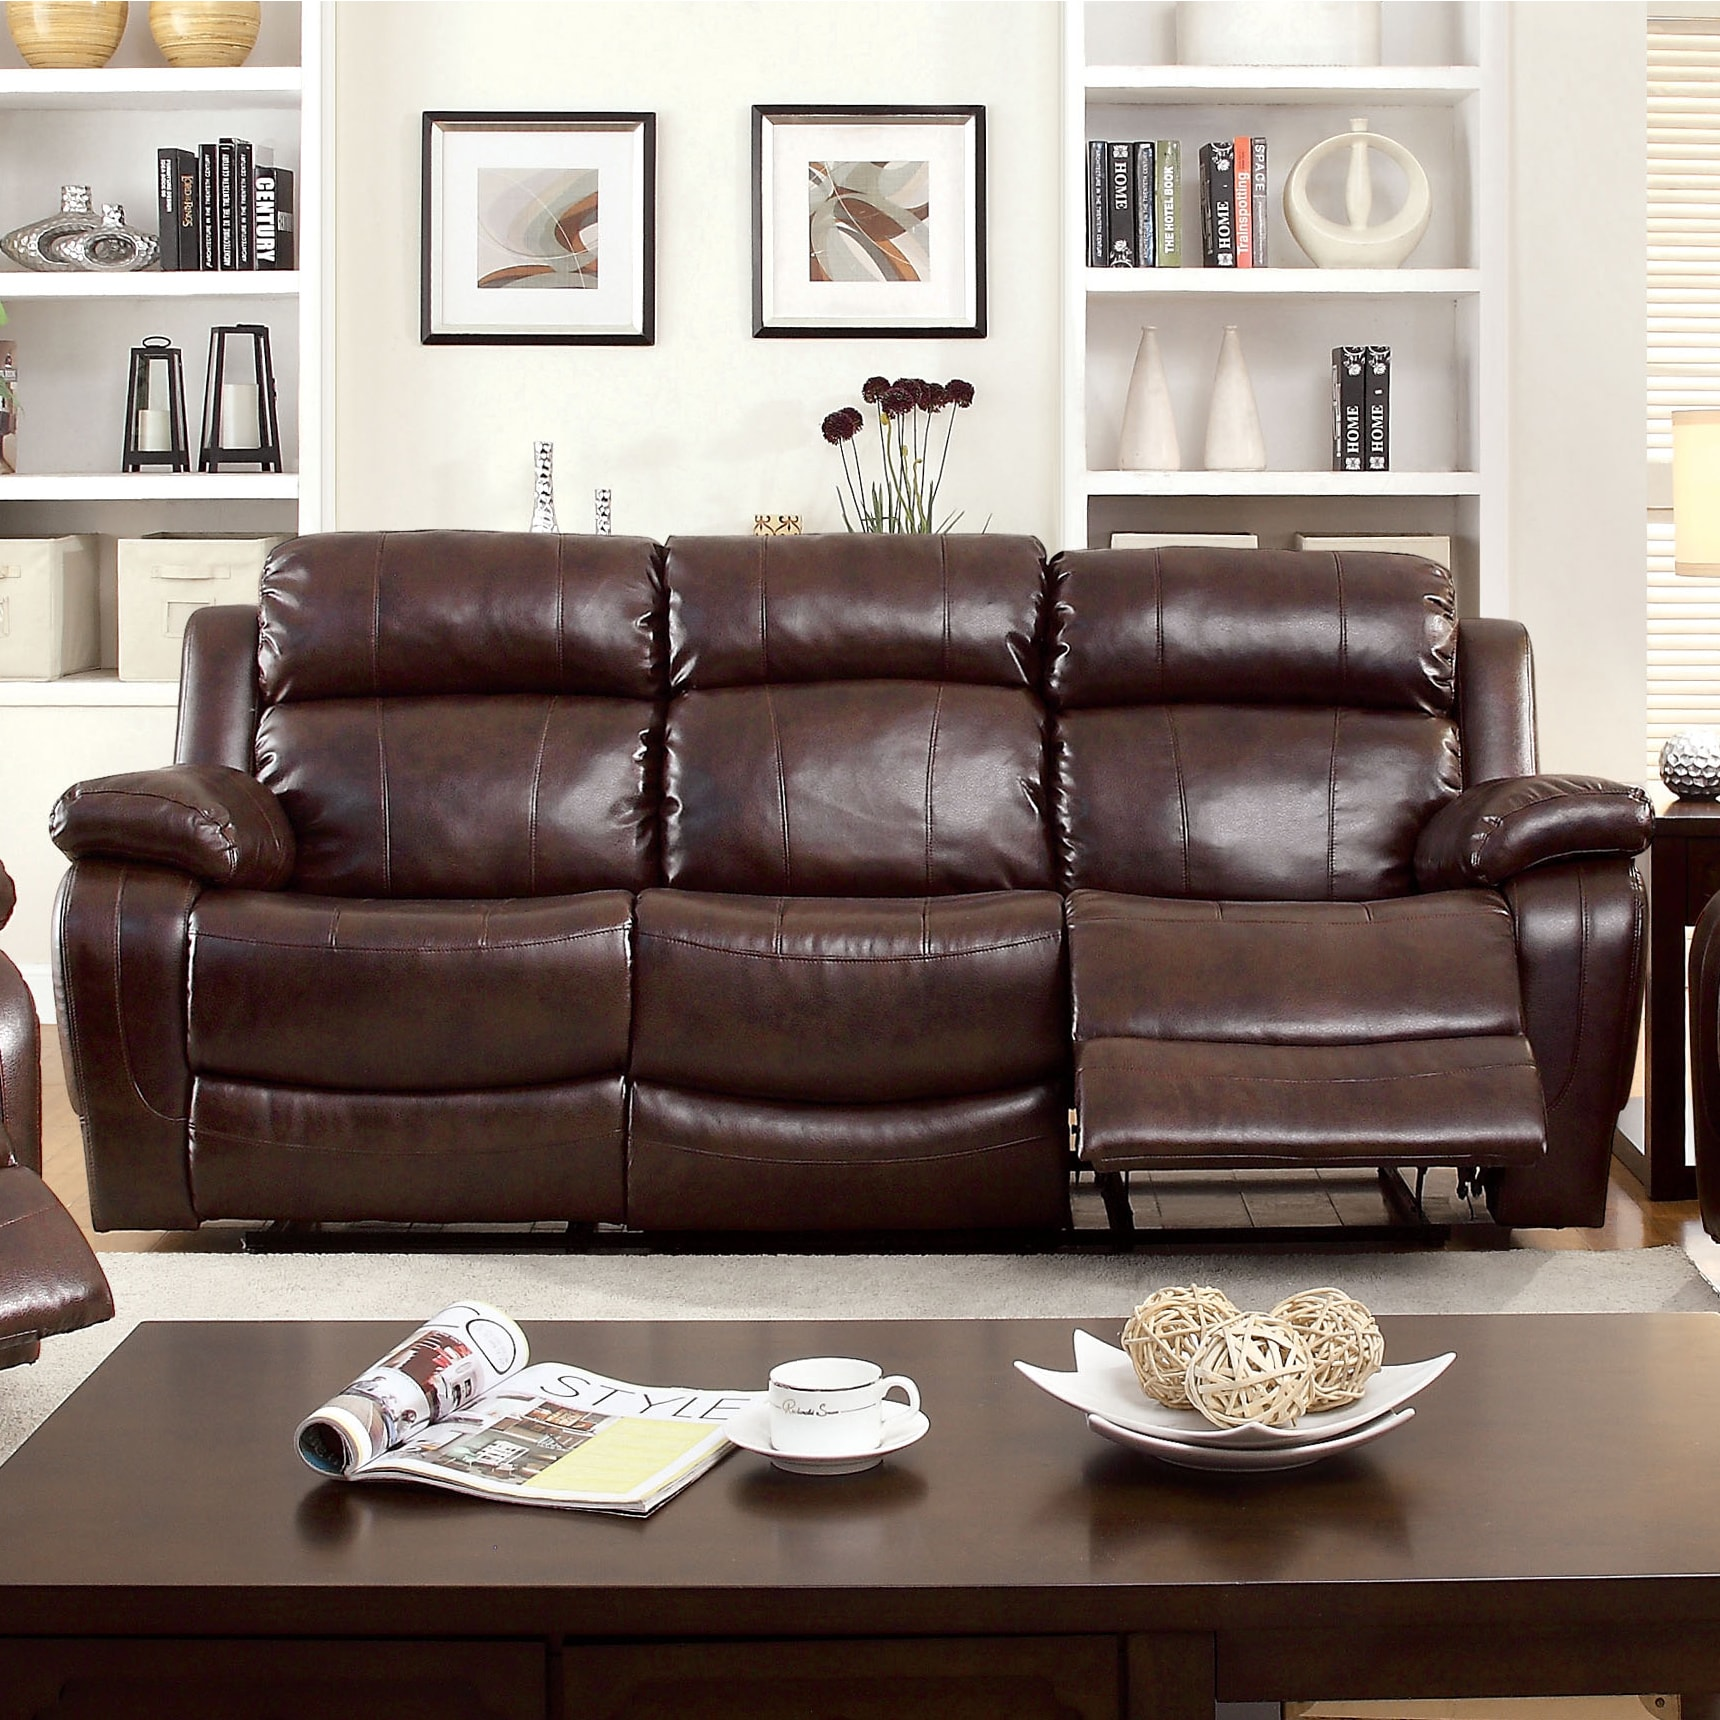 Furniture of America Menezi Brown Bonded Leather Reclinin...